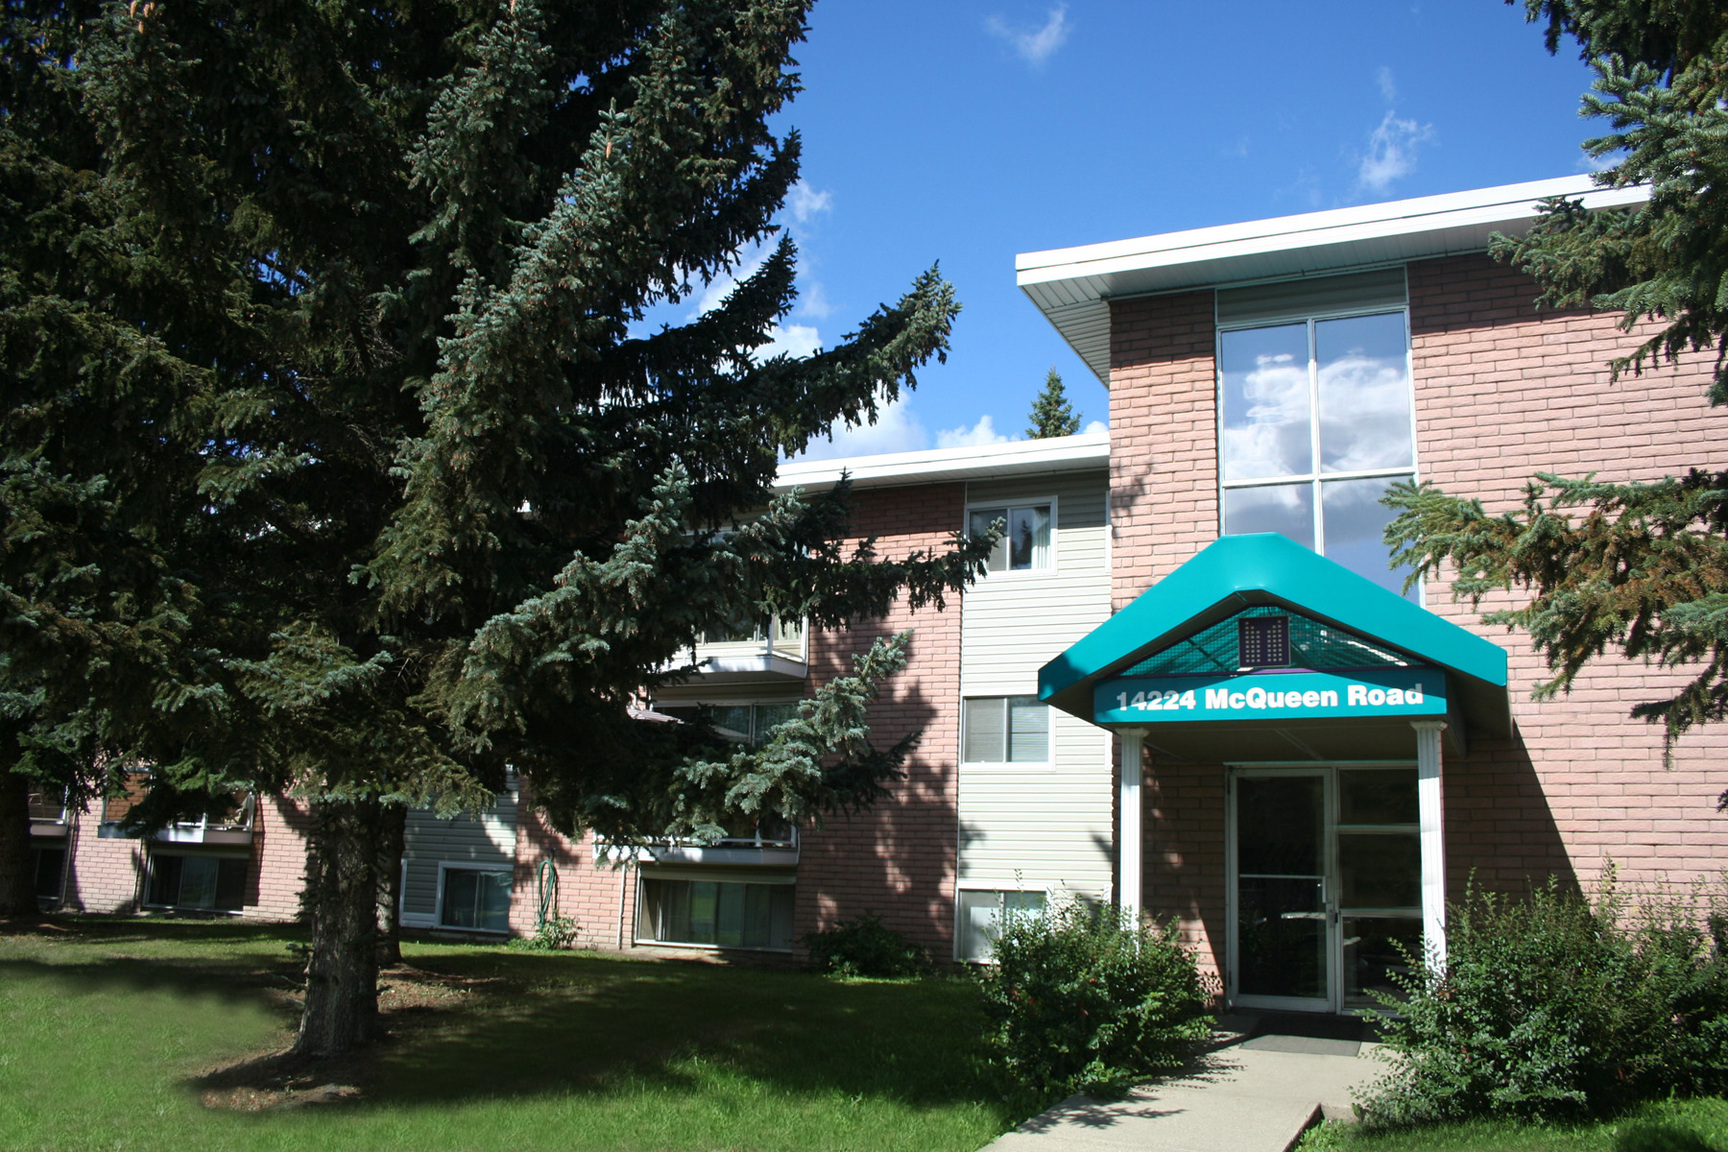 14224 McQueen Rd NW, Edmonton, AB - $1,320 CAD/ month